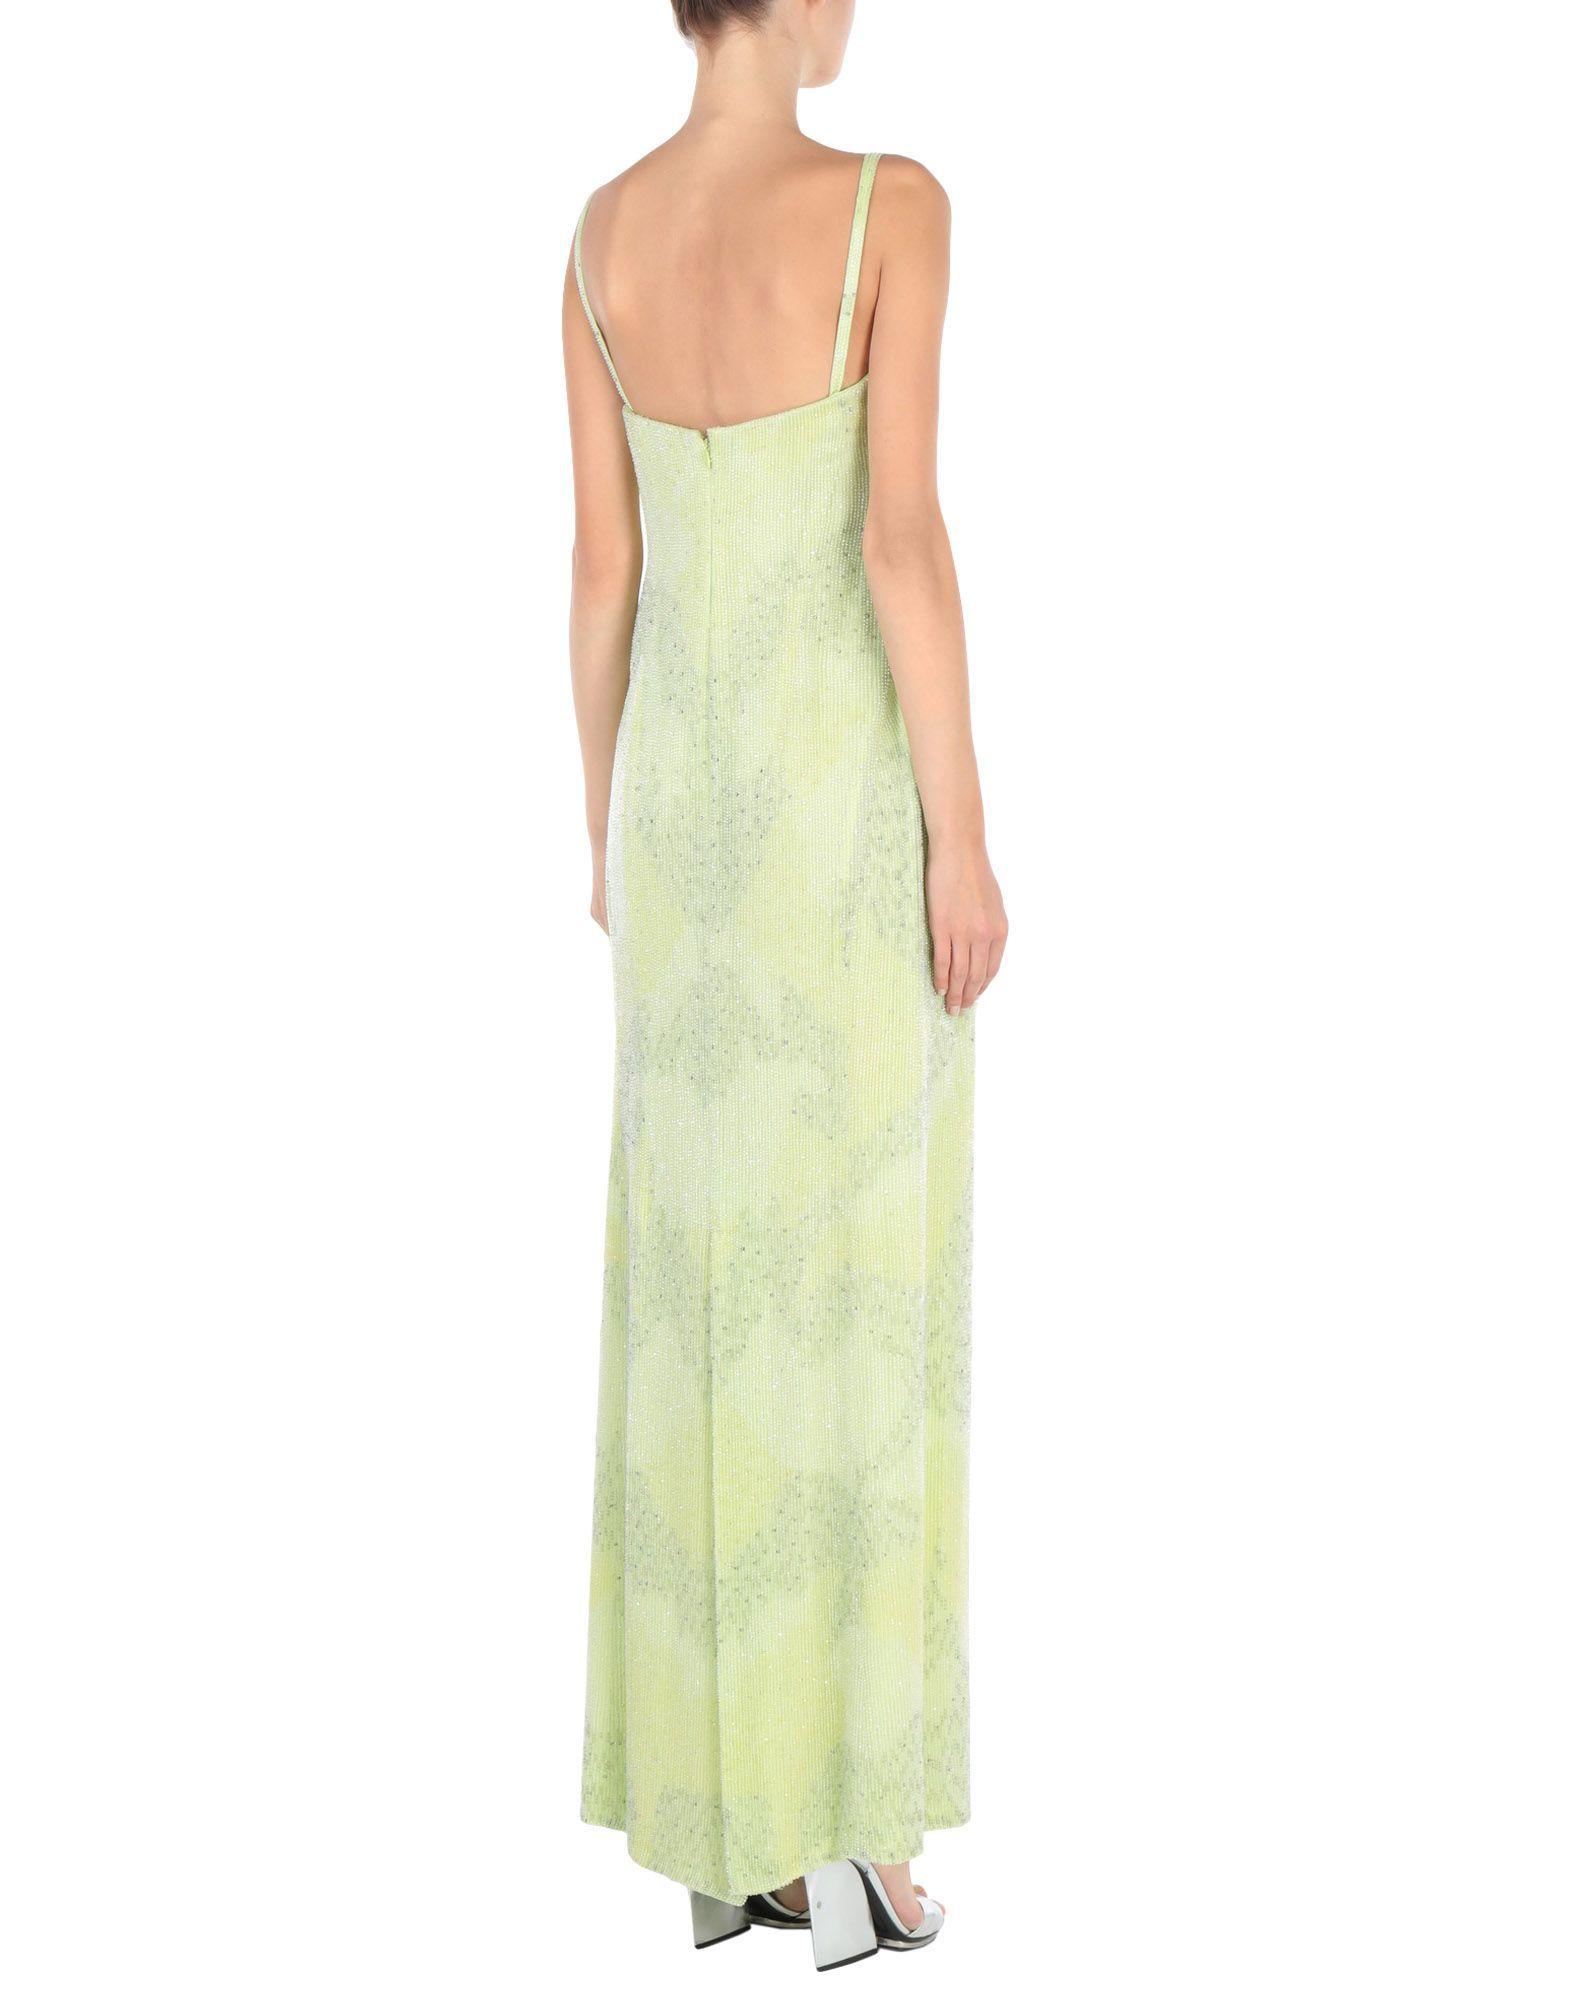 Giorgio Armani Light Green Silk Slip Dress